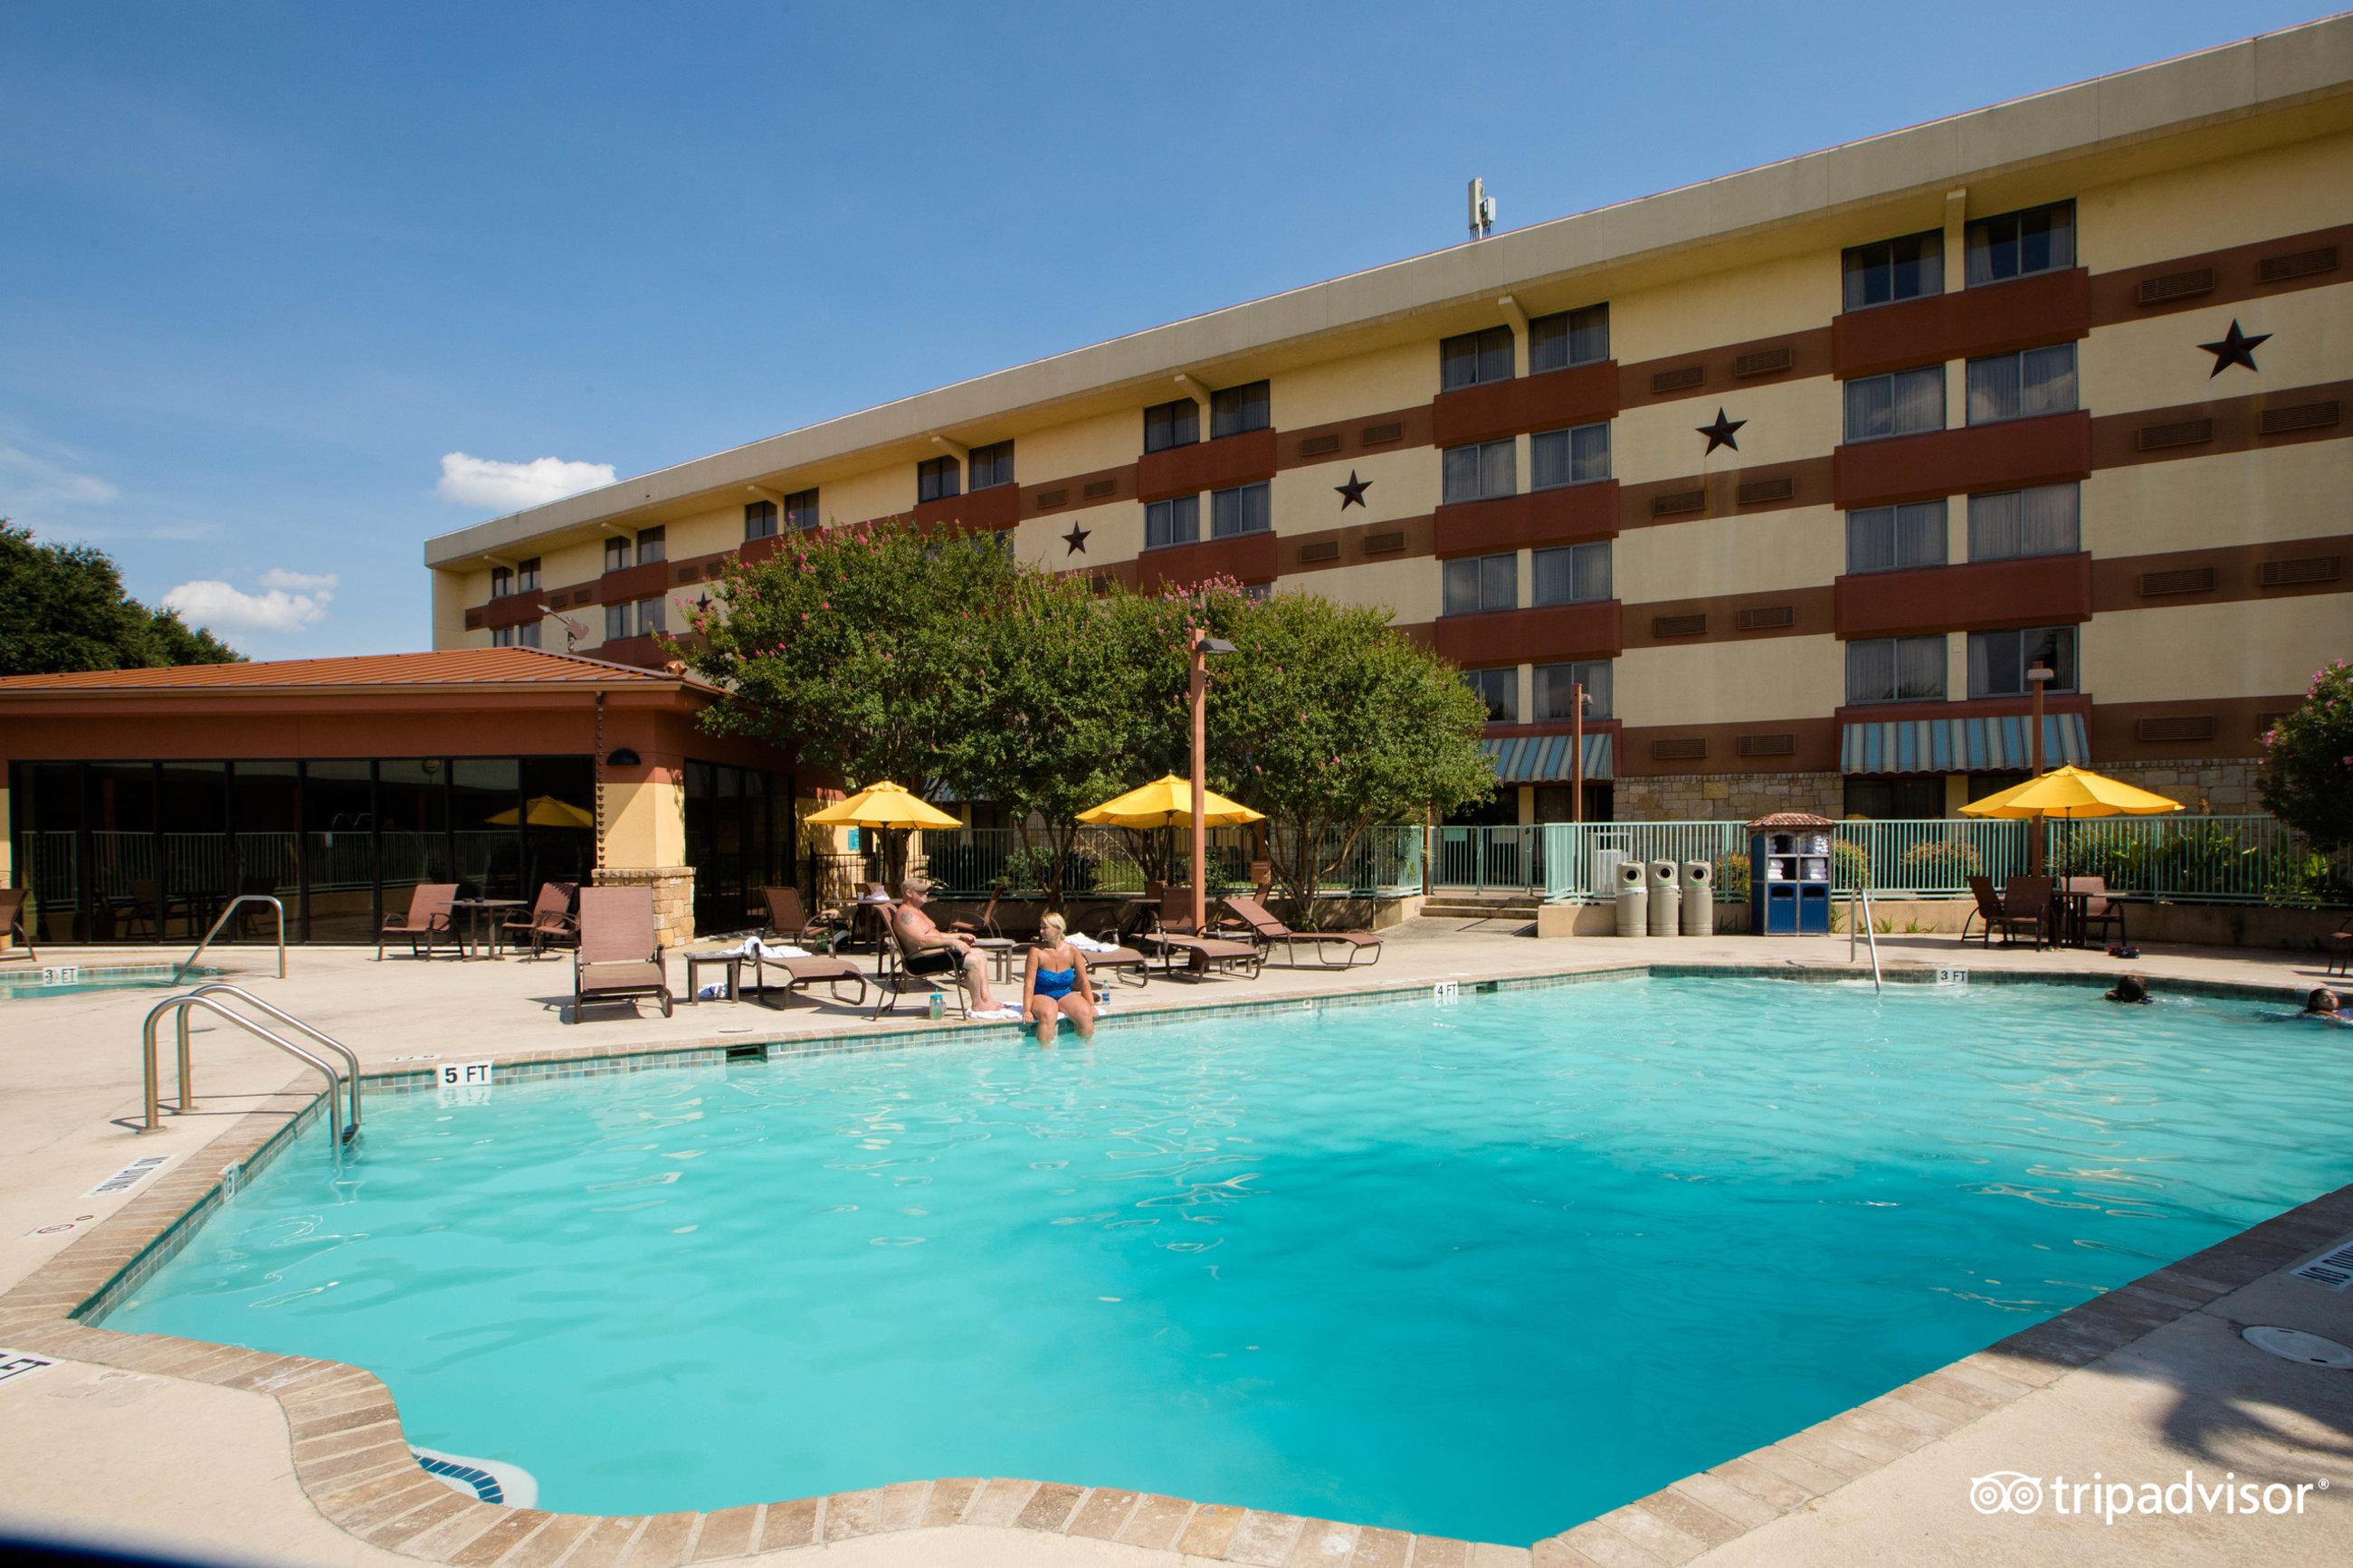 wyndham garden hotel - austin (tx) 2017 review - family vacation